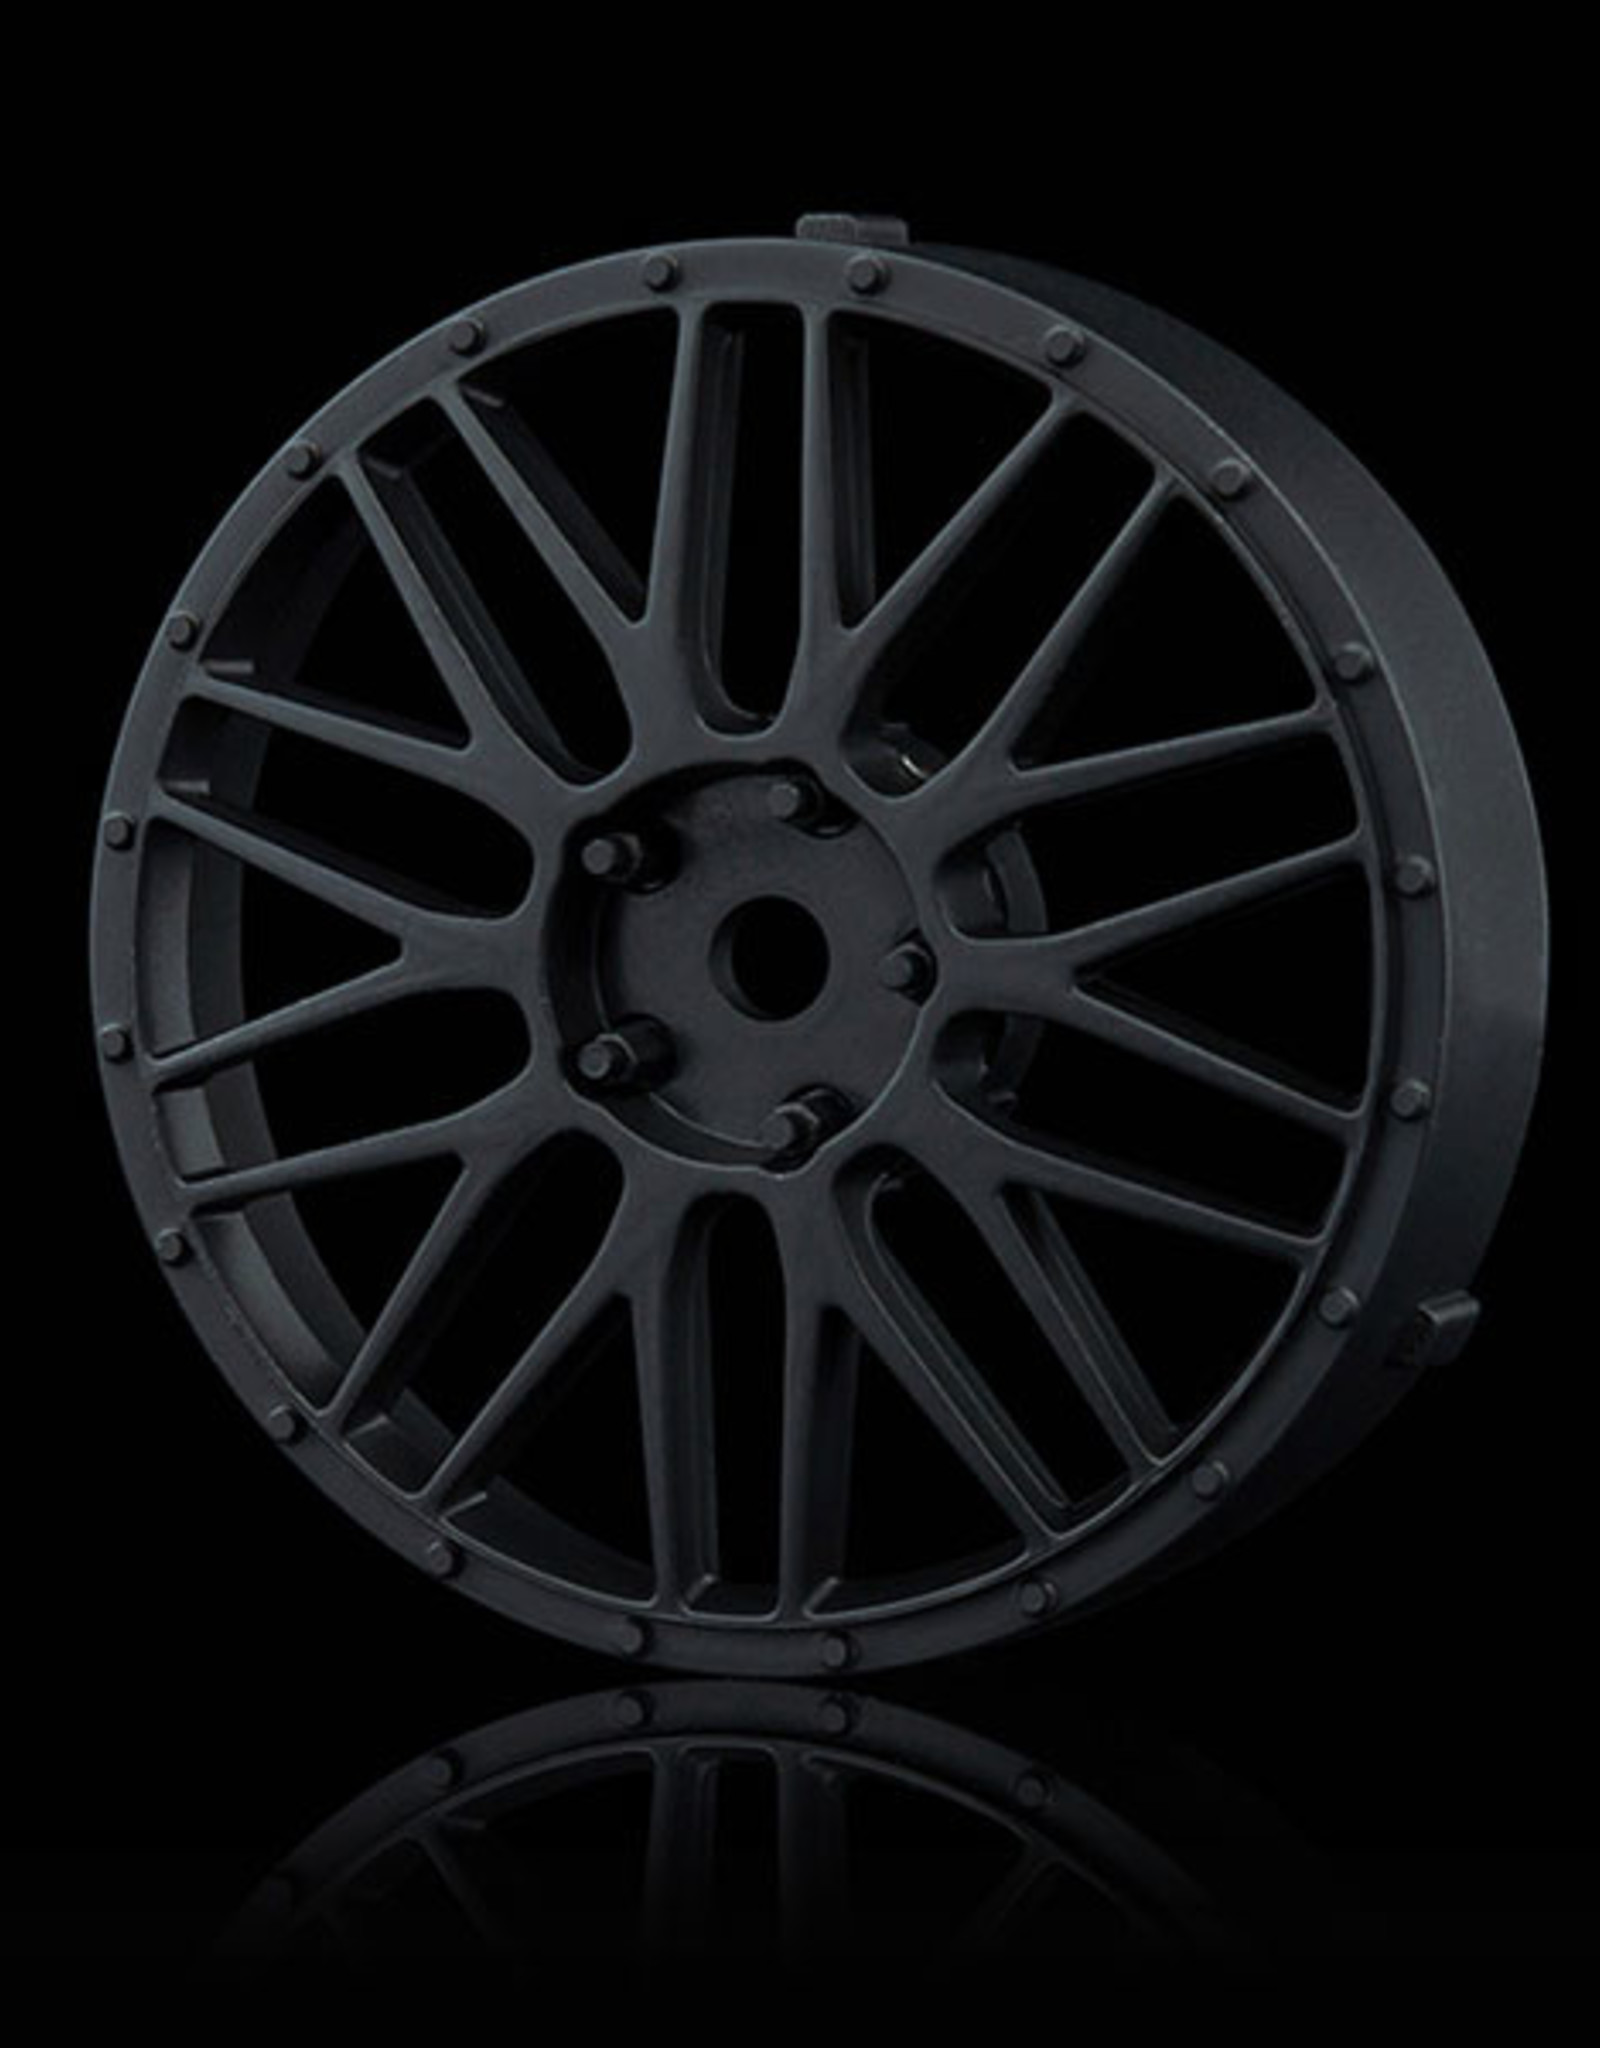 MST LM Changeable Wheel Face (2pcs.) by MST Flat Black